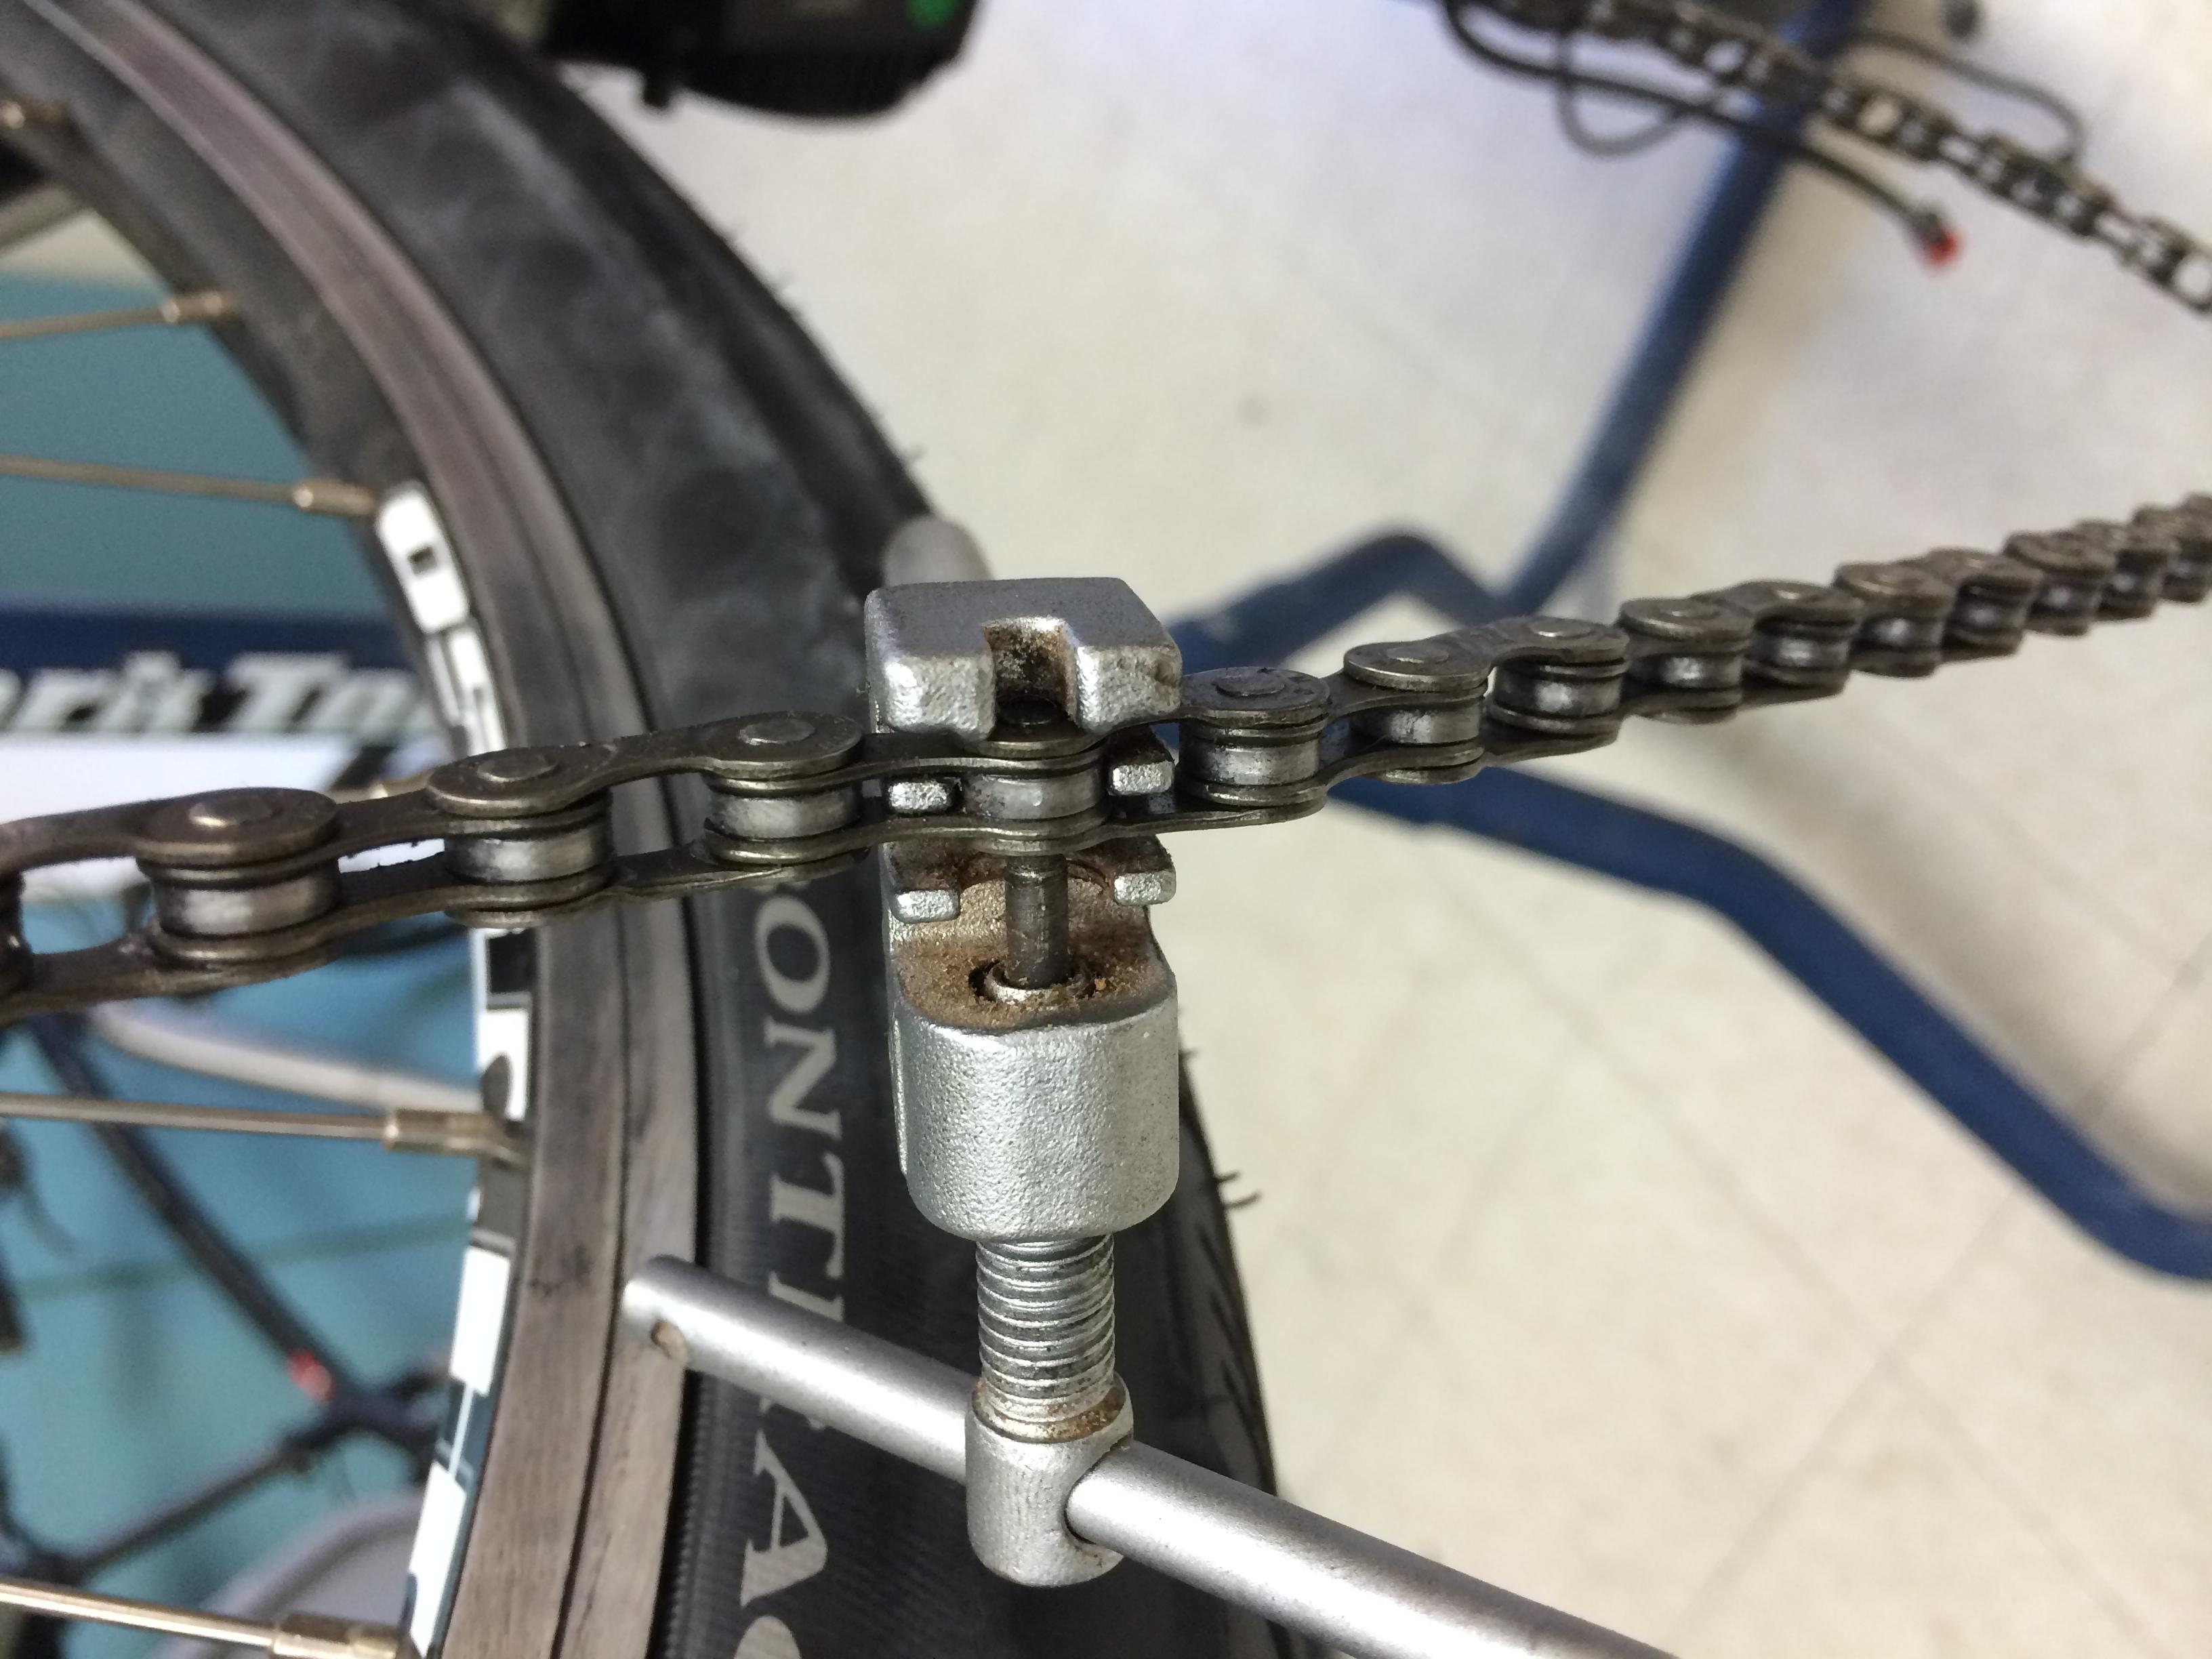 Removing Chain to Remove Front Derailleur